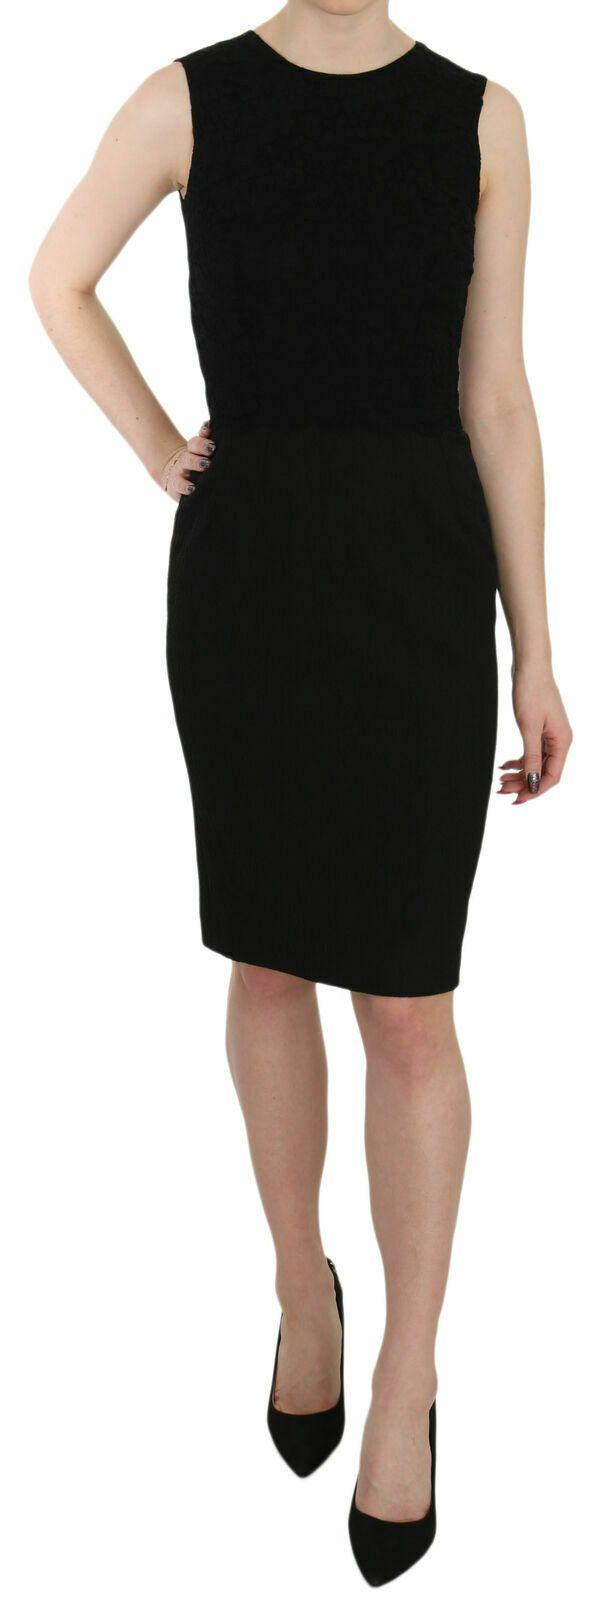 Dolce & Gabbana Women's Laced Top Sheath Dress Black DR1950 - IT42|M